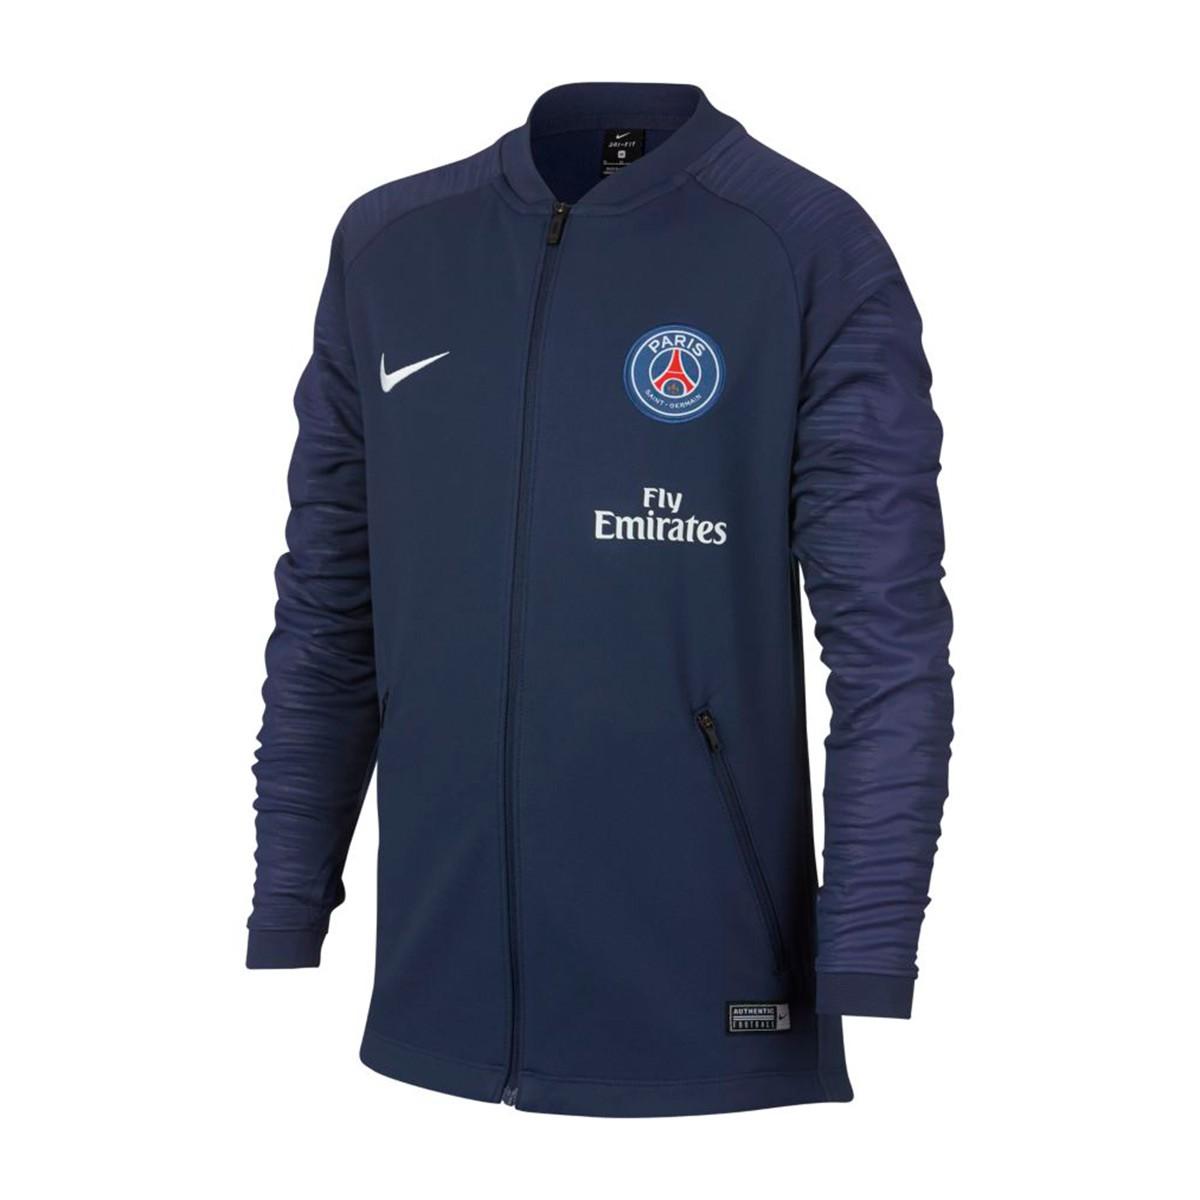 finest selection 33e59 b561d Chaqueta Paris Saint-Germain Pre-Match 2018-2019 Niño Midnight navy-White